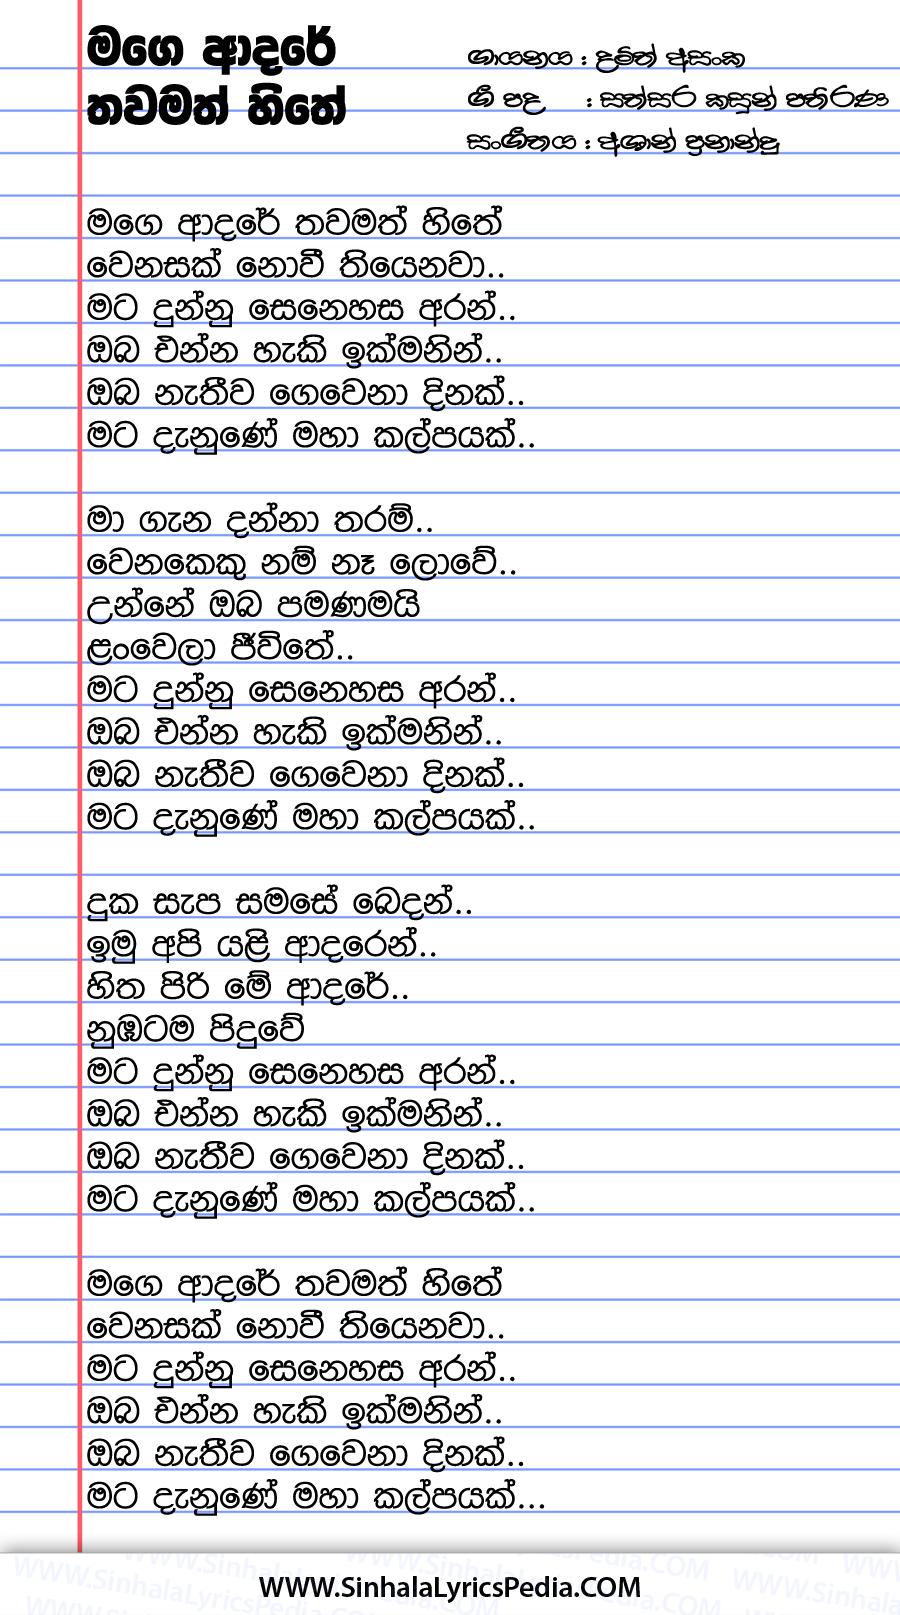 Mage Adare Thawamath Hithe Song Lyrics